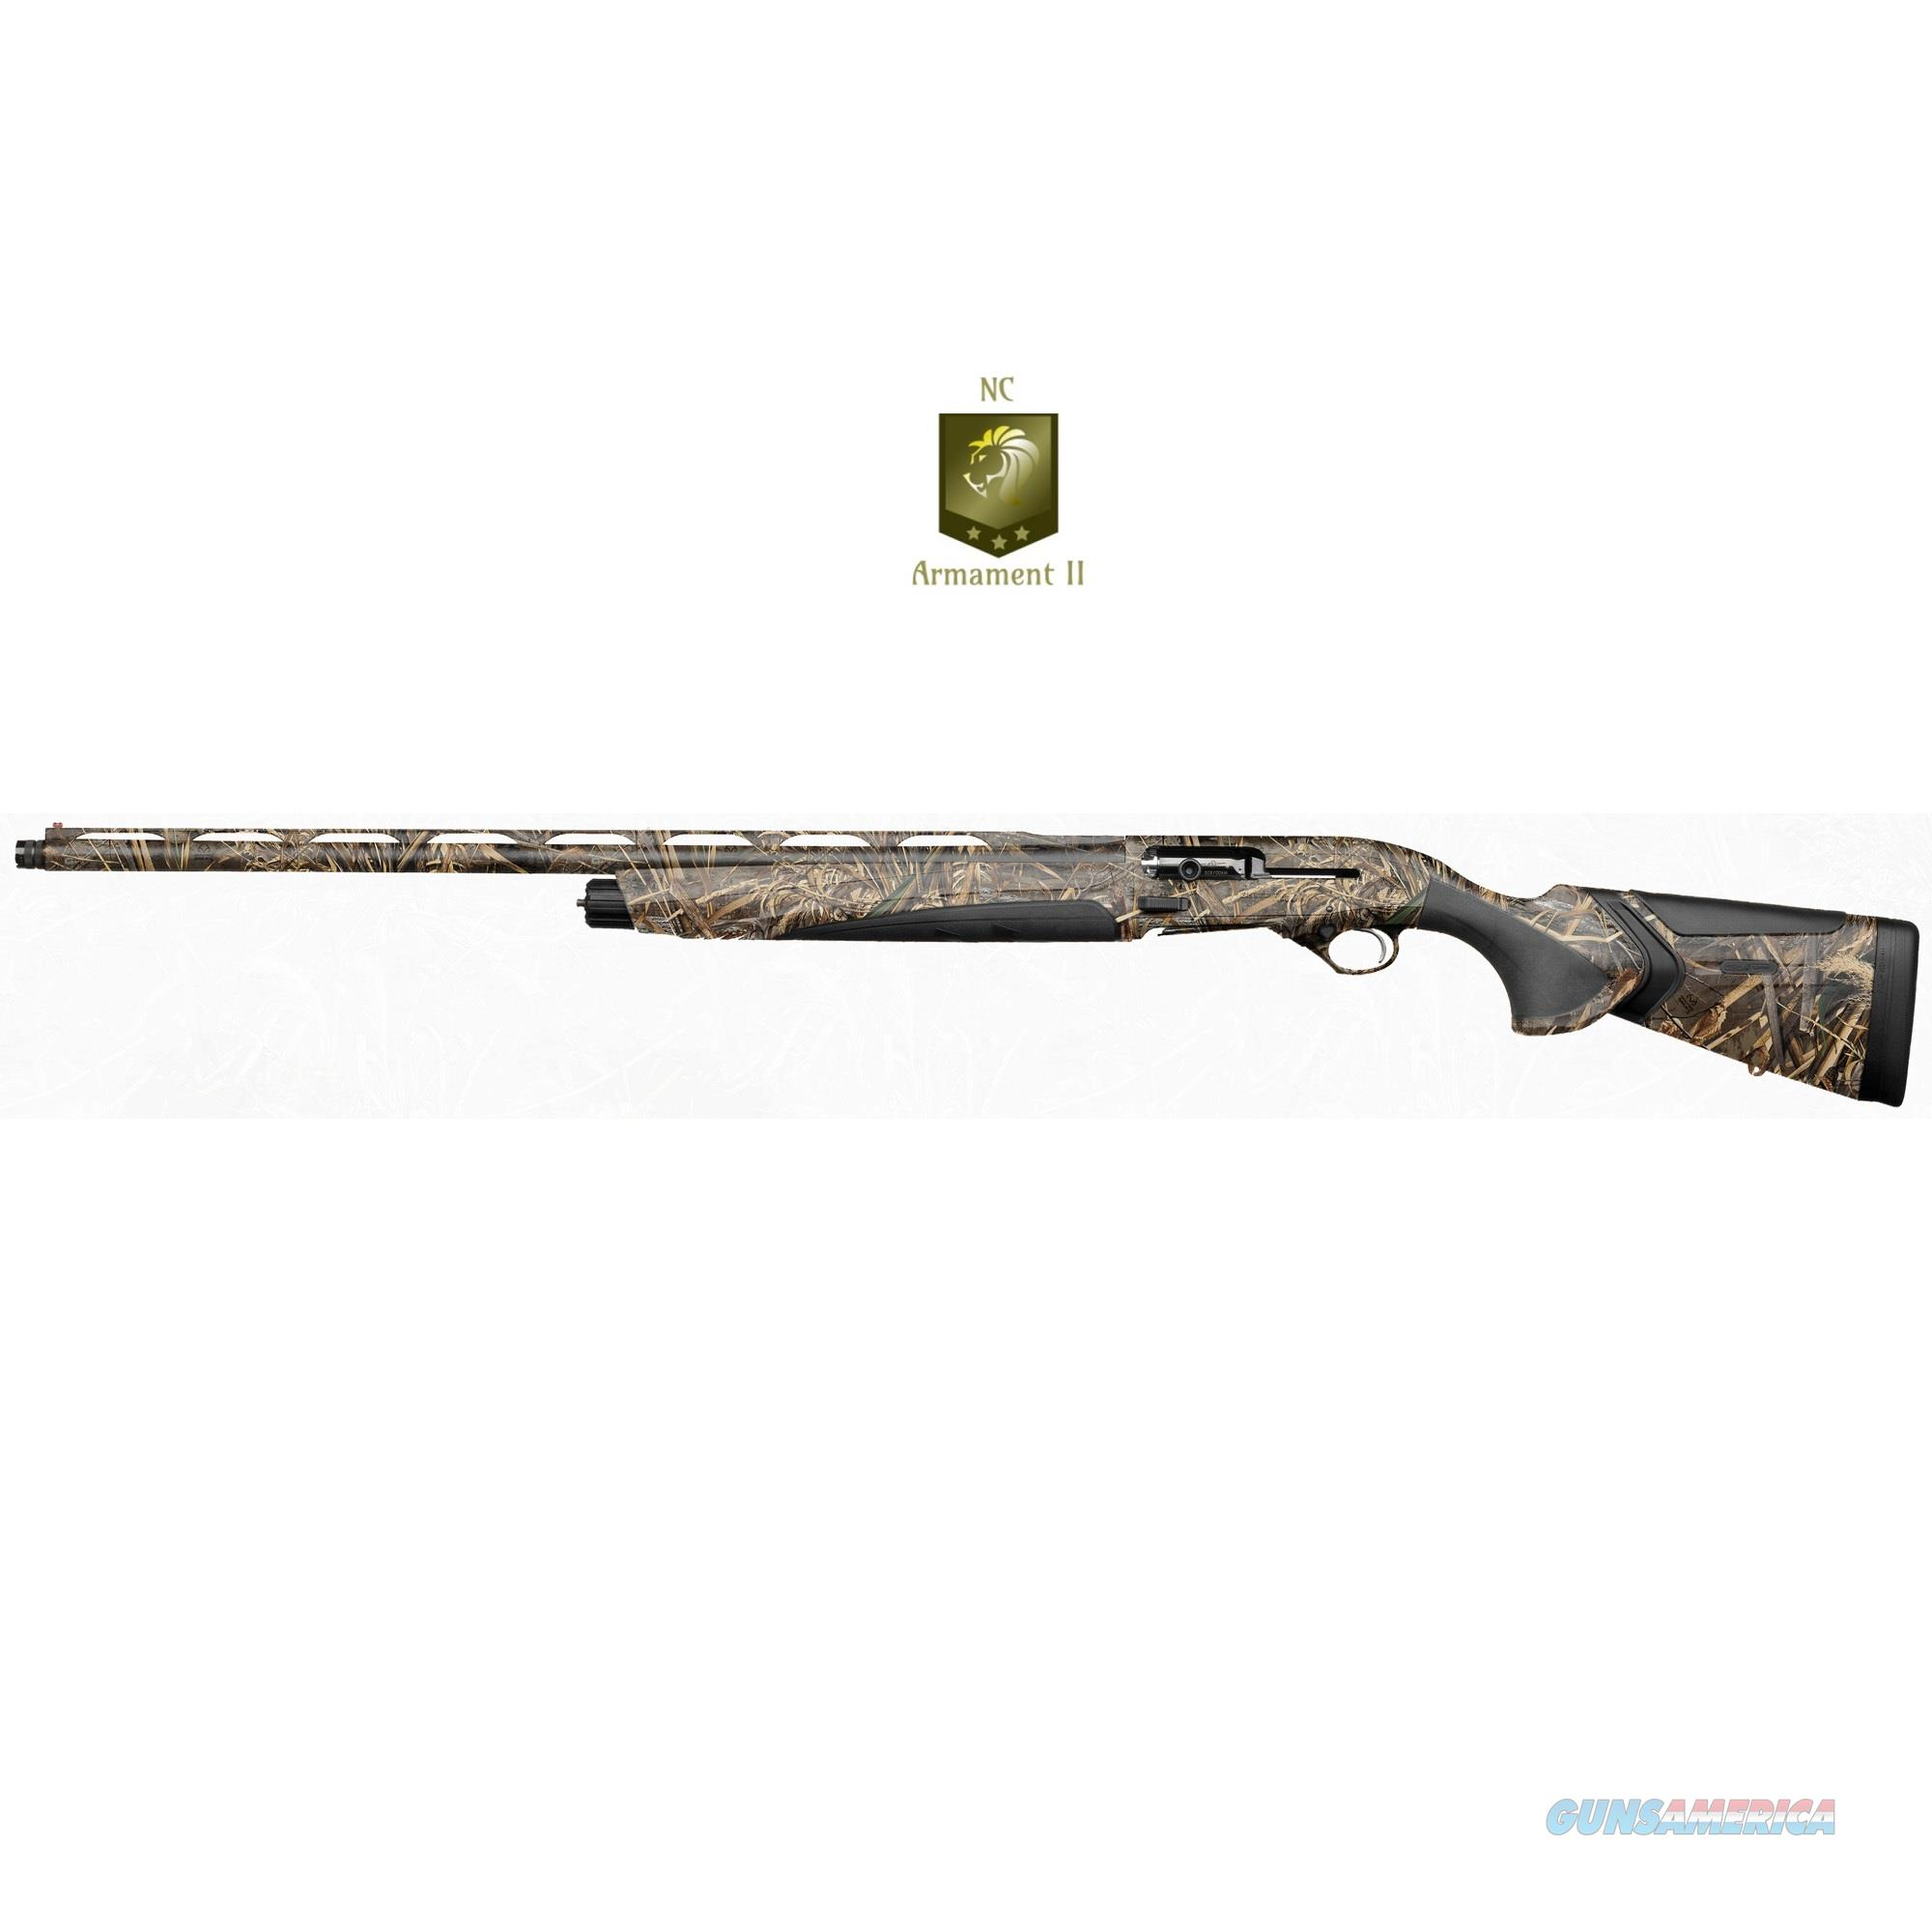 Beretta A400 Xtreme PLUS KO 12ga 28 Inch Left Handed Max-5 Camo  Guns > Shotguns > Beretta Shotguns > Autoloaders > Trap/Skeet